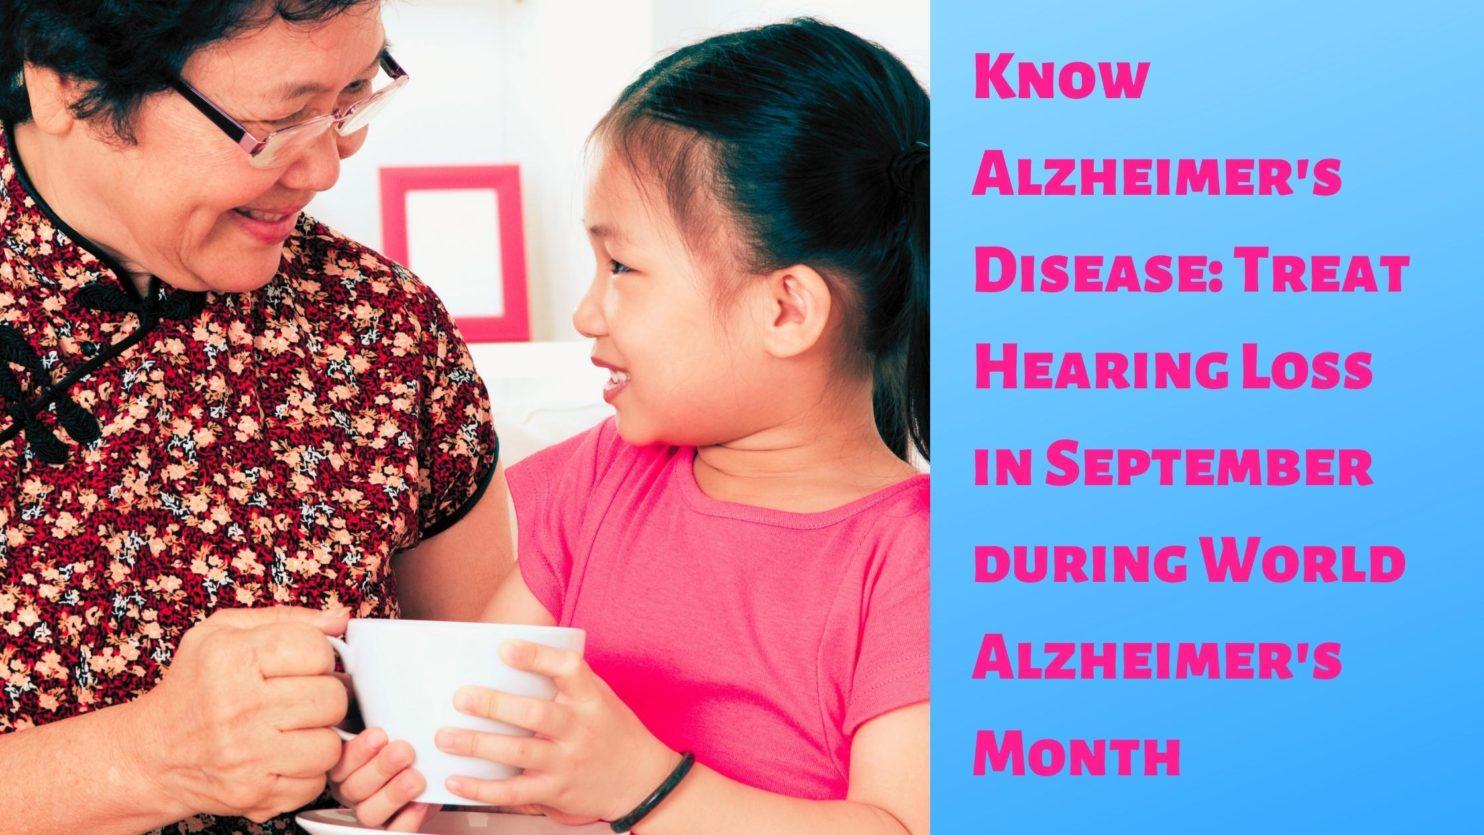 Know Alzheimer's Disease Treat Hearing Loss in September during World Alzheimer's Month(22)